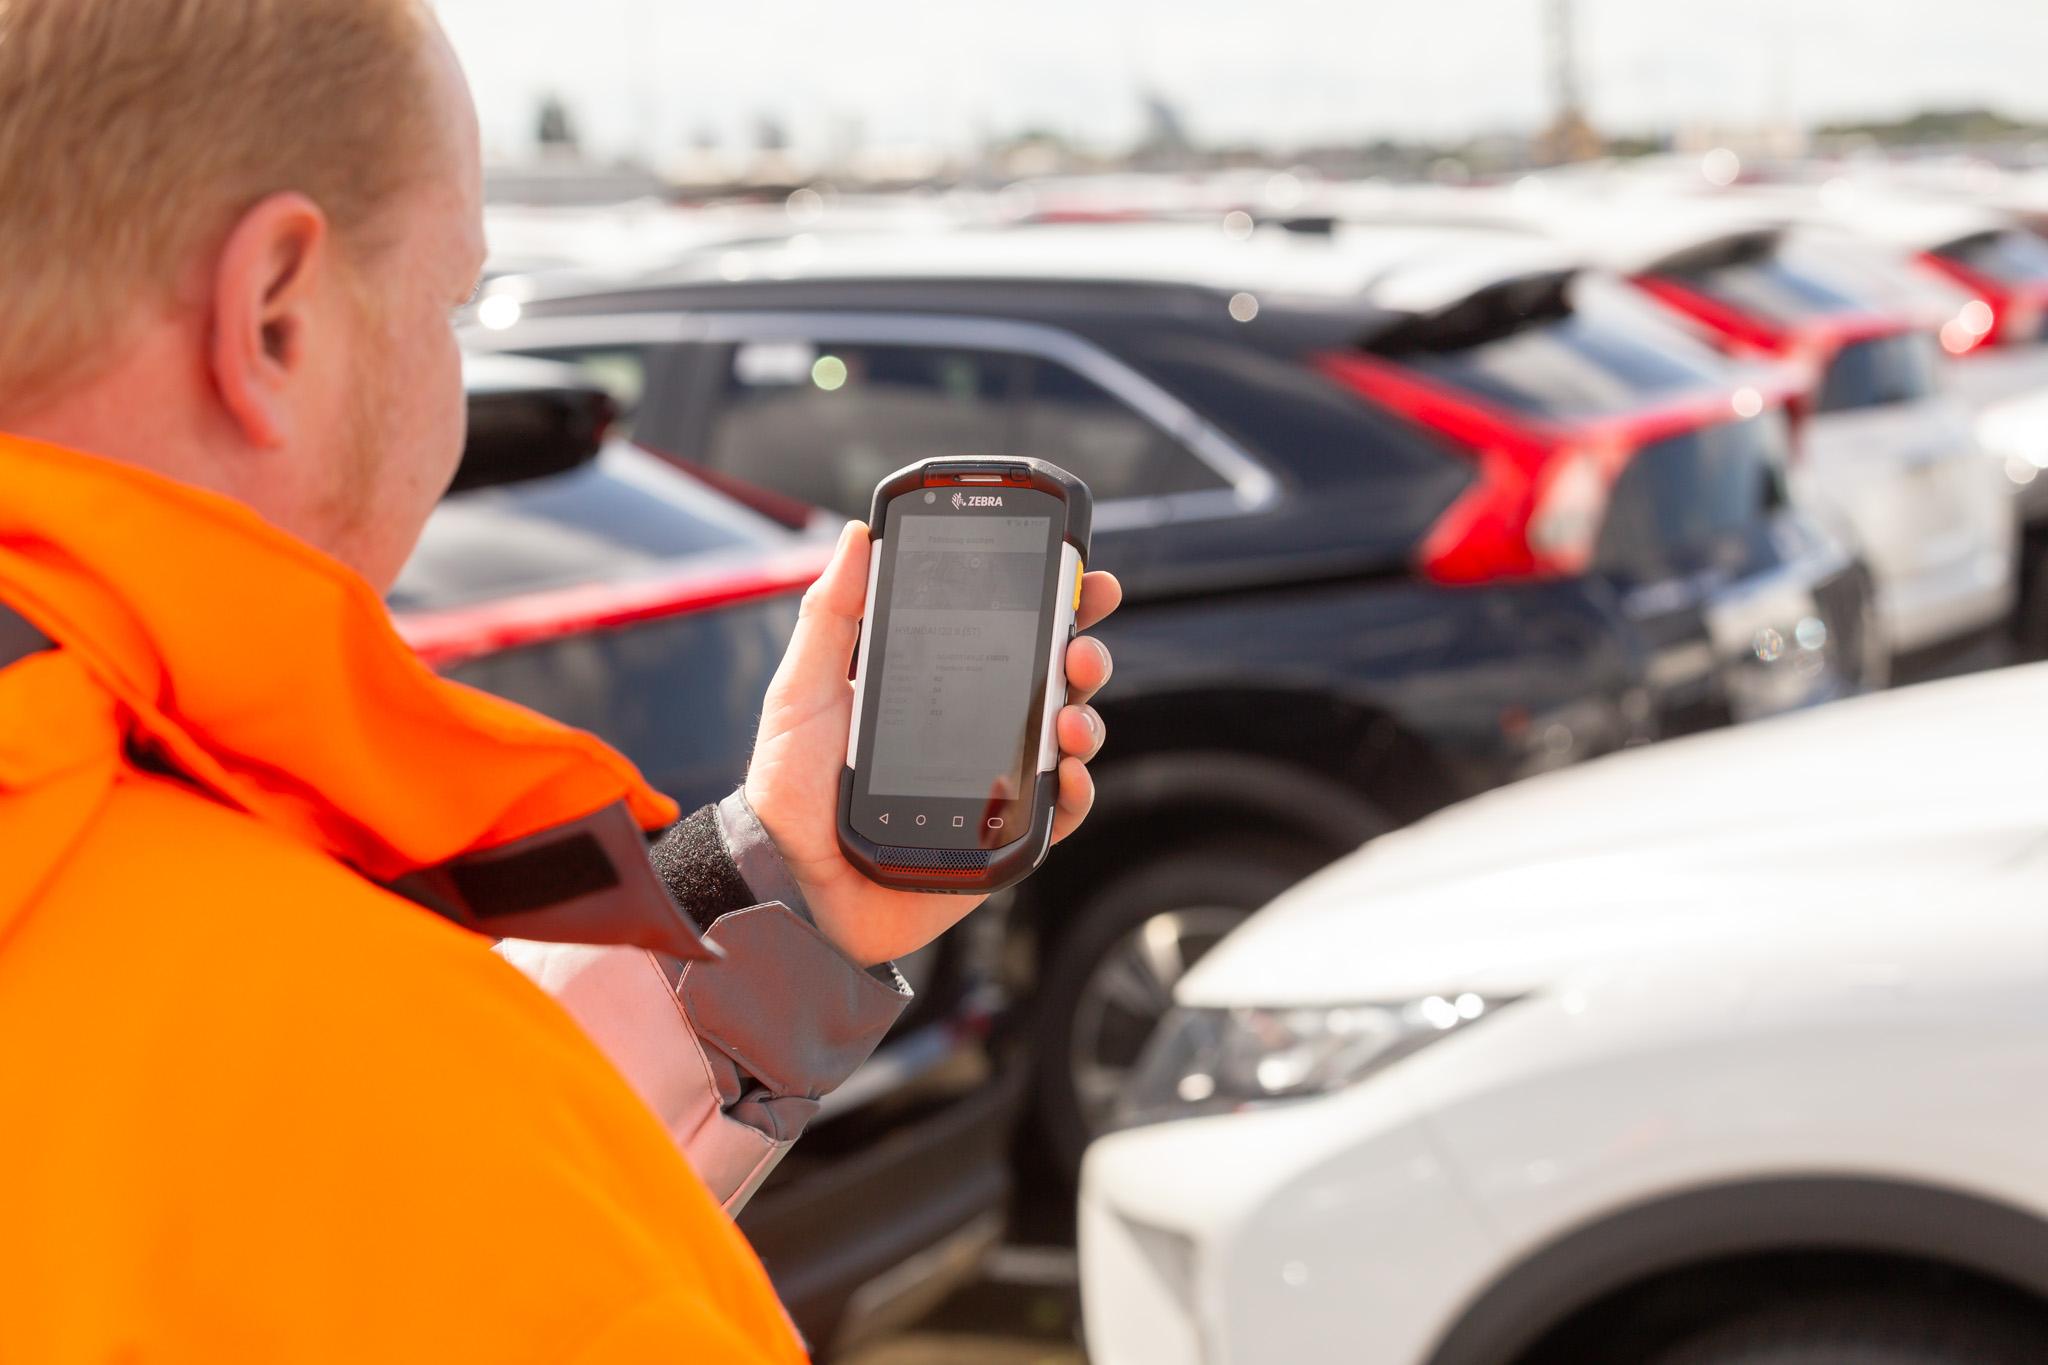 Autoterminal:  Platz für 95.000 Fahrzeuge, Bild: BLG LOGISTICS/Tristan Vankann